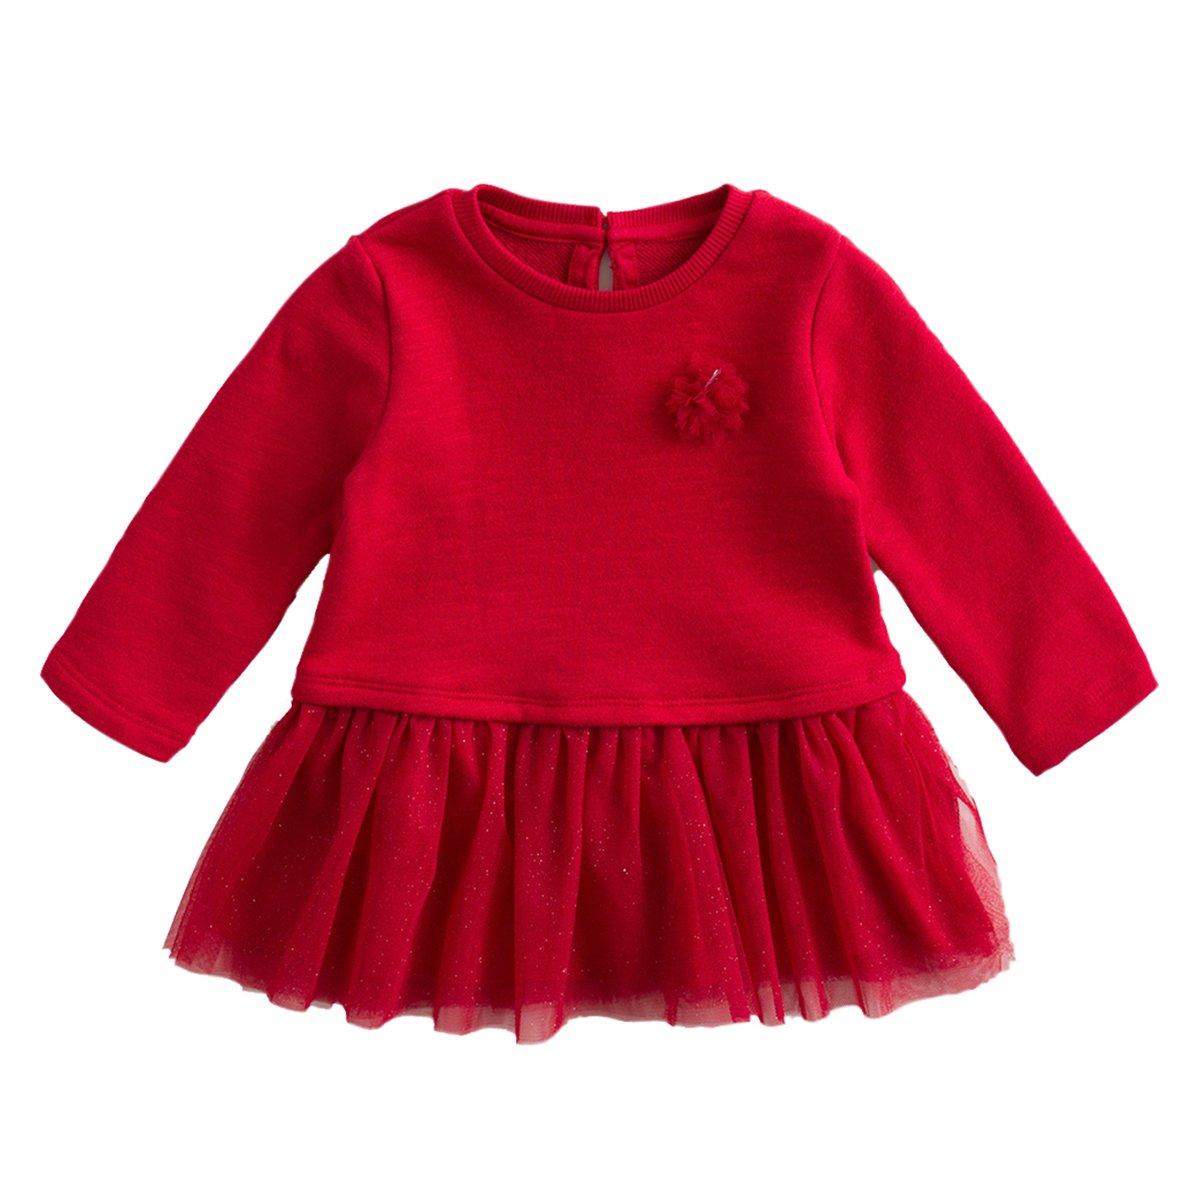 6050a6e2d062c 18 ベビーガールズ DRESS janie marc Months B07H6C8KCZ ディープレッド cm) (73-ワンピースチュニック